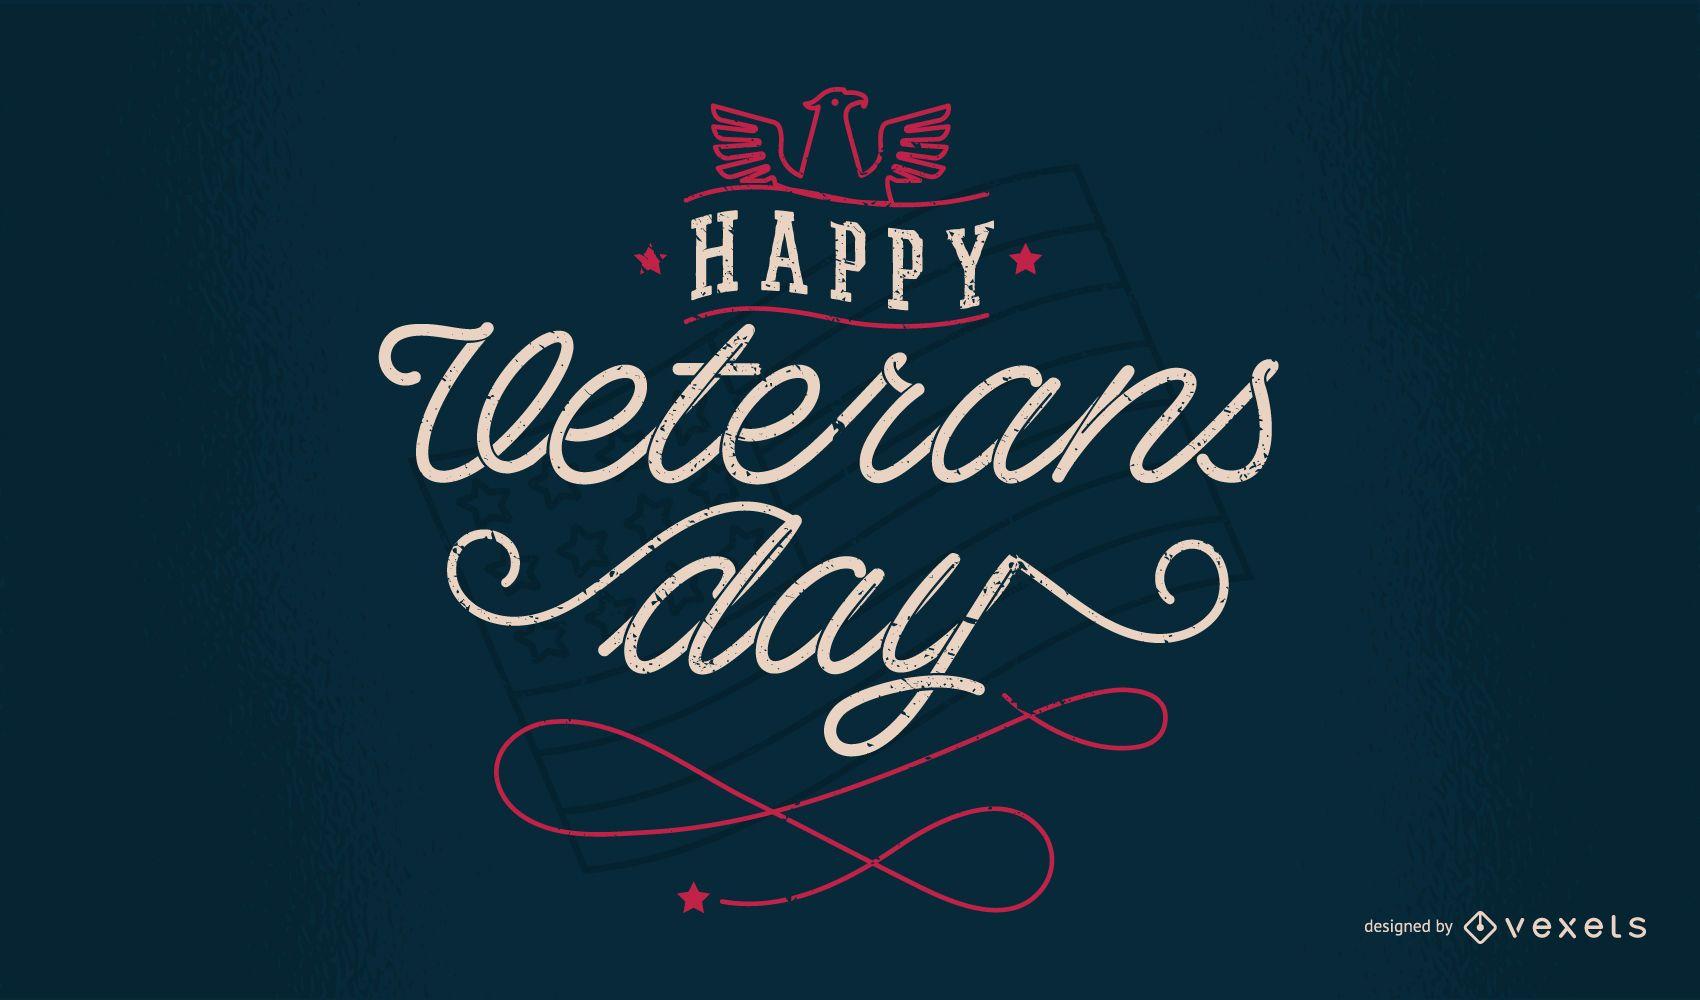 Design de letras do feliz dia dos veteranos